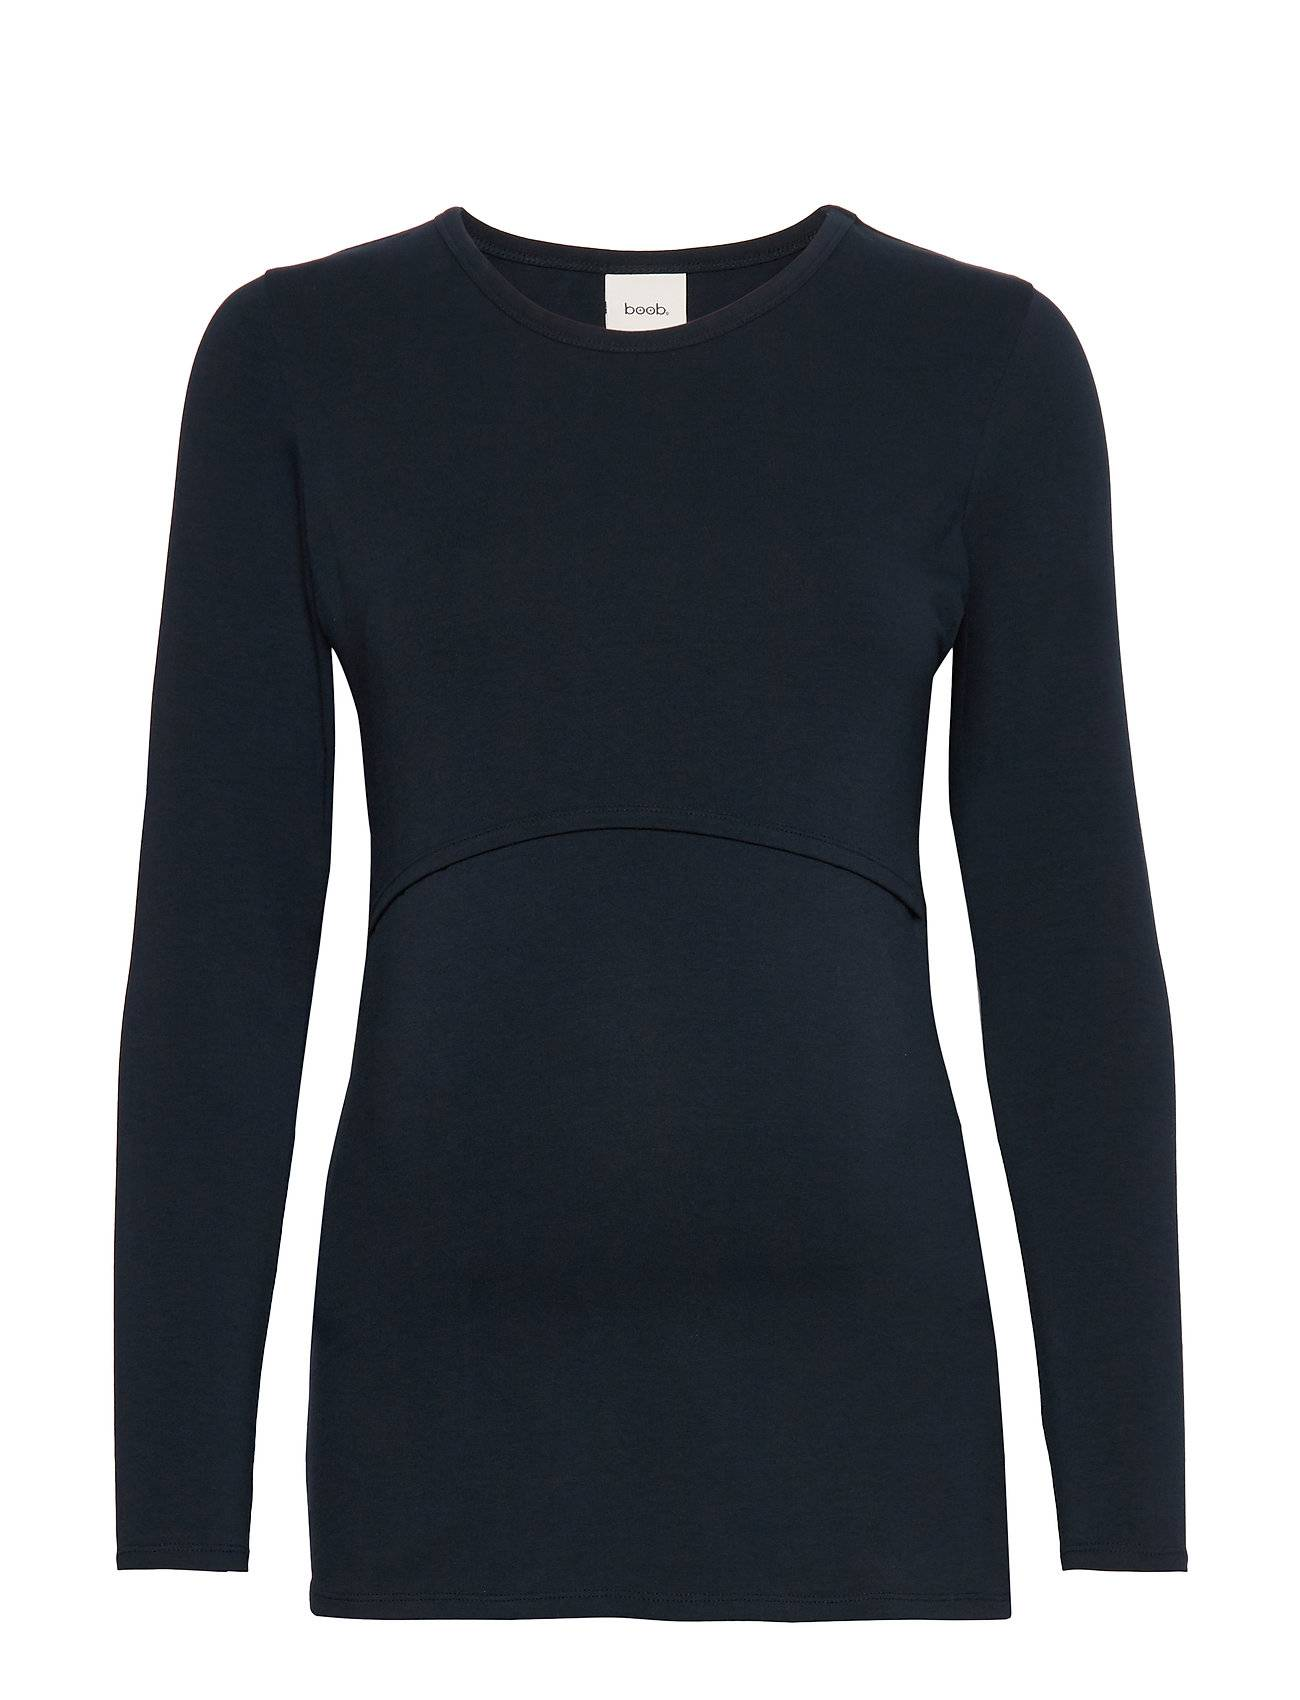 Boob Classic Long-Sleeved Top T-shirts & Tops Long-sleeved Sininen Boob